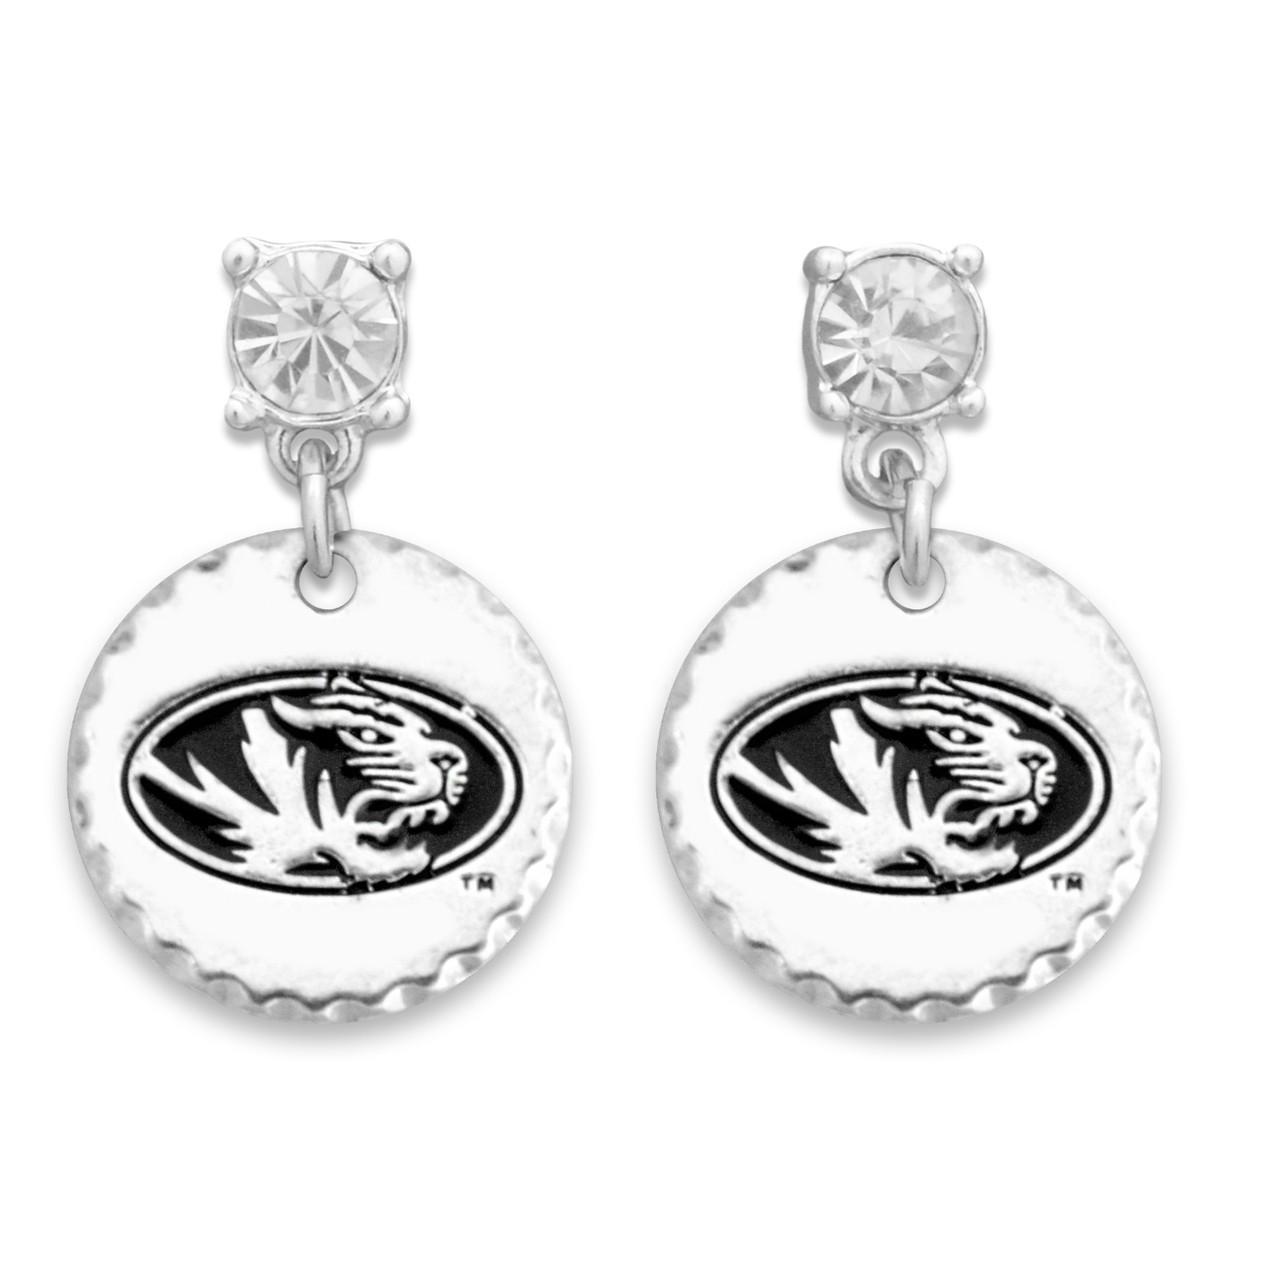 Missouri Tigers Head of the Class Earrings